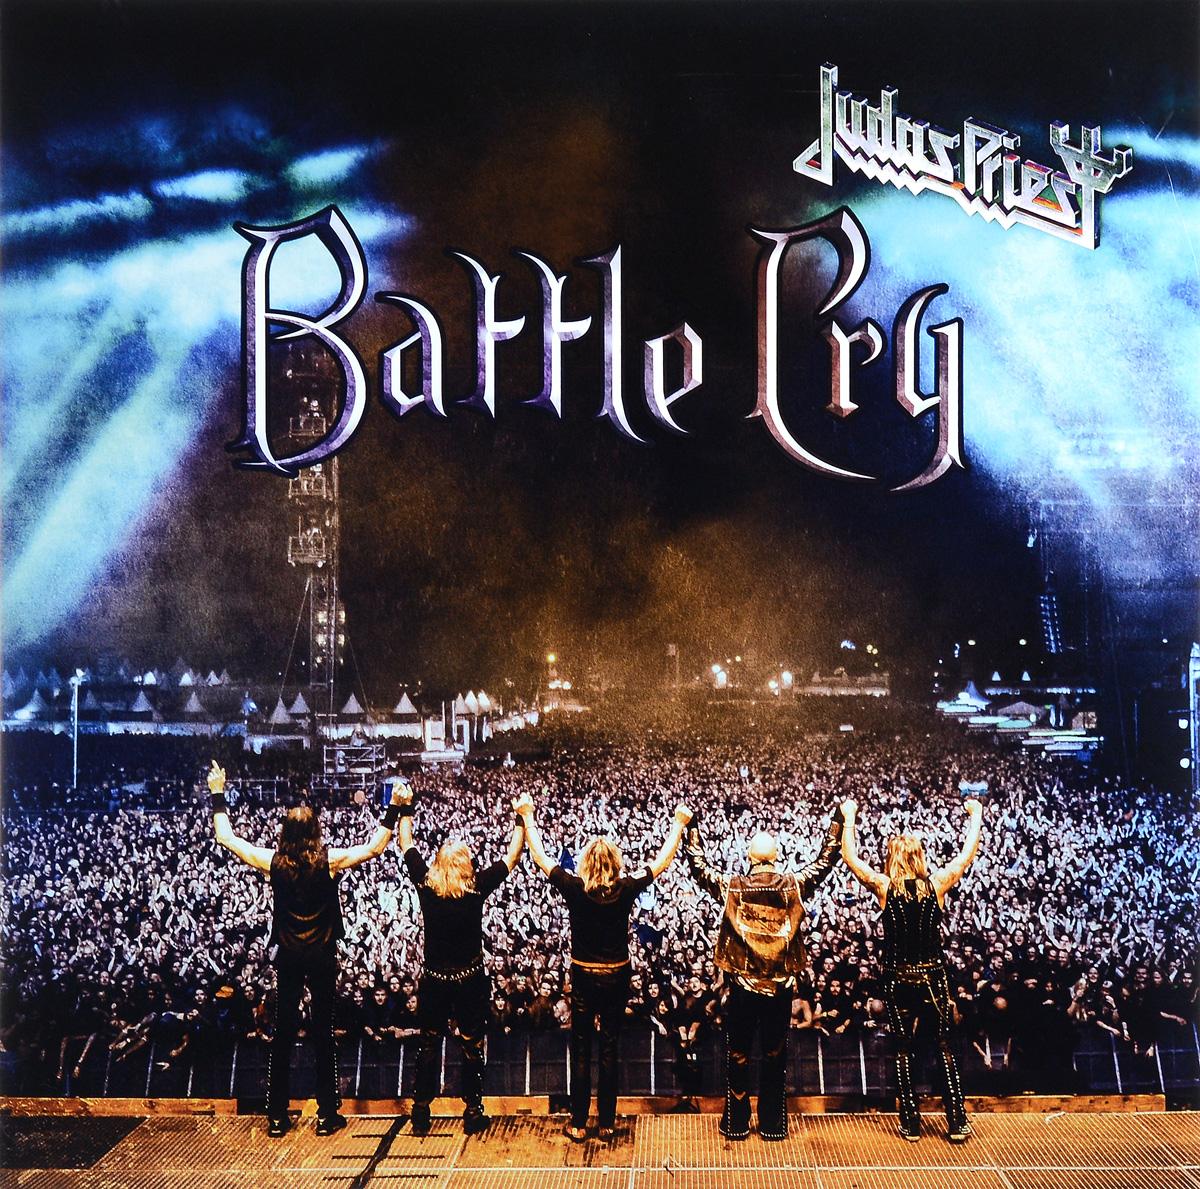 Judas Priest Judas Priest. Battle Cry (2 LP) henglong 1 16 scale 2 4ghz rc tank sherman m4a3 battle tank u s army ultimate metal version smoke sound metal gear tracks